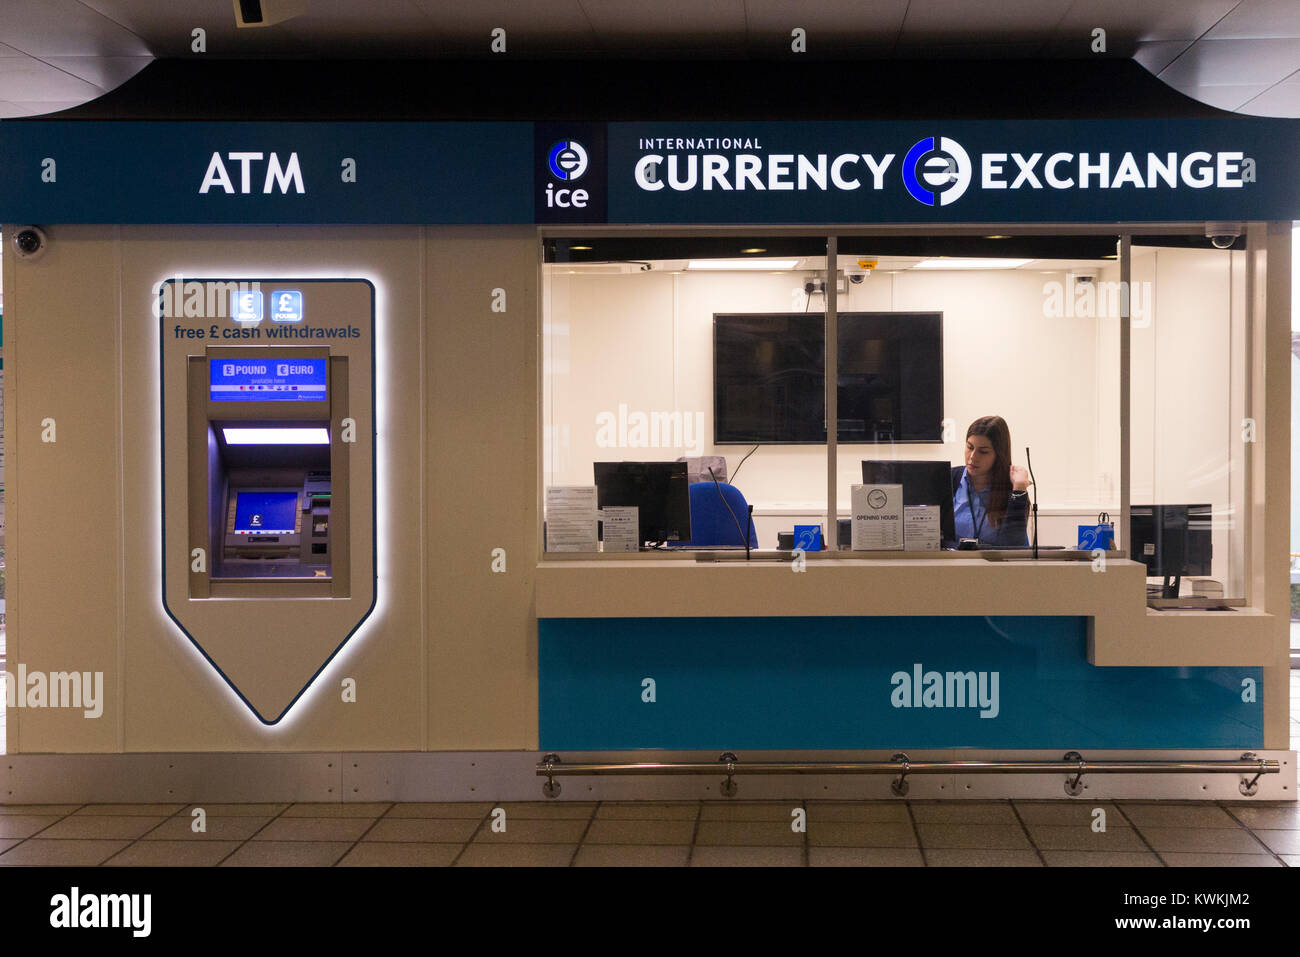 ice bureau de change international currency exchange at london city airport london uk 93